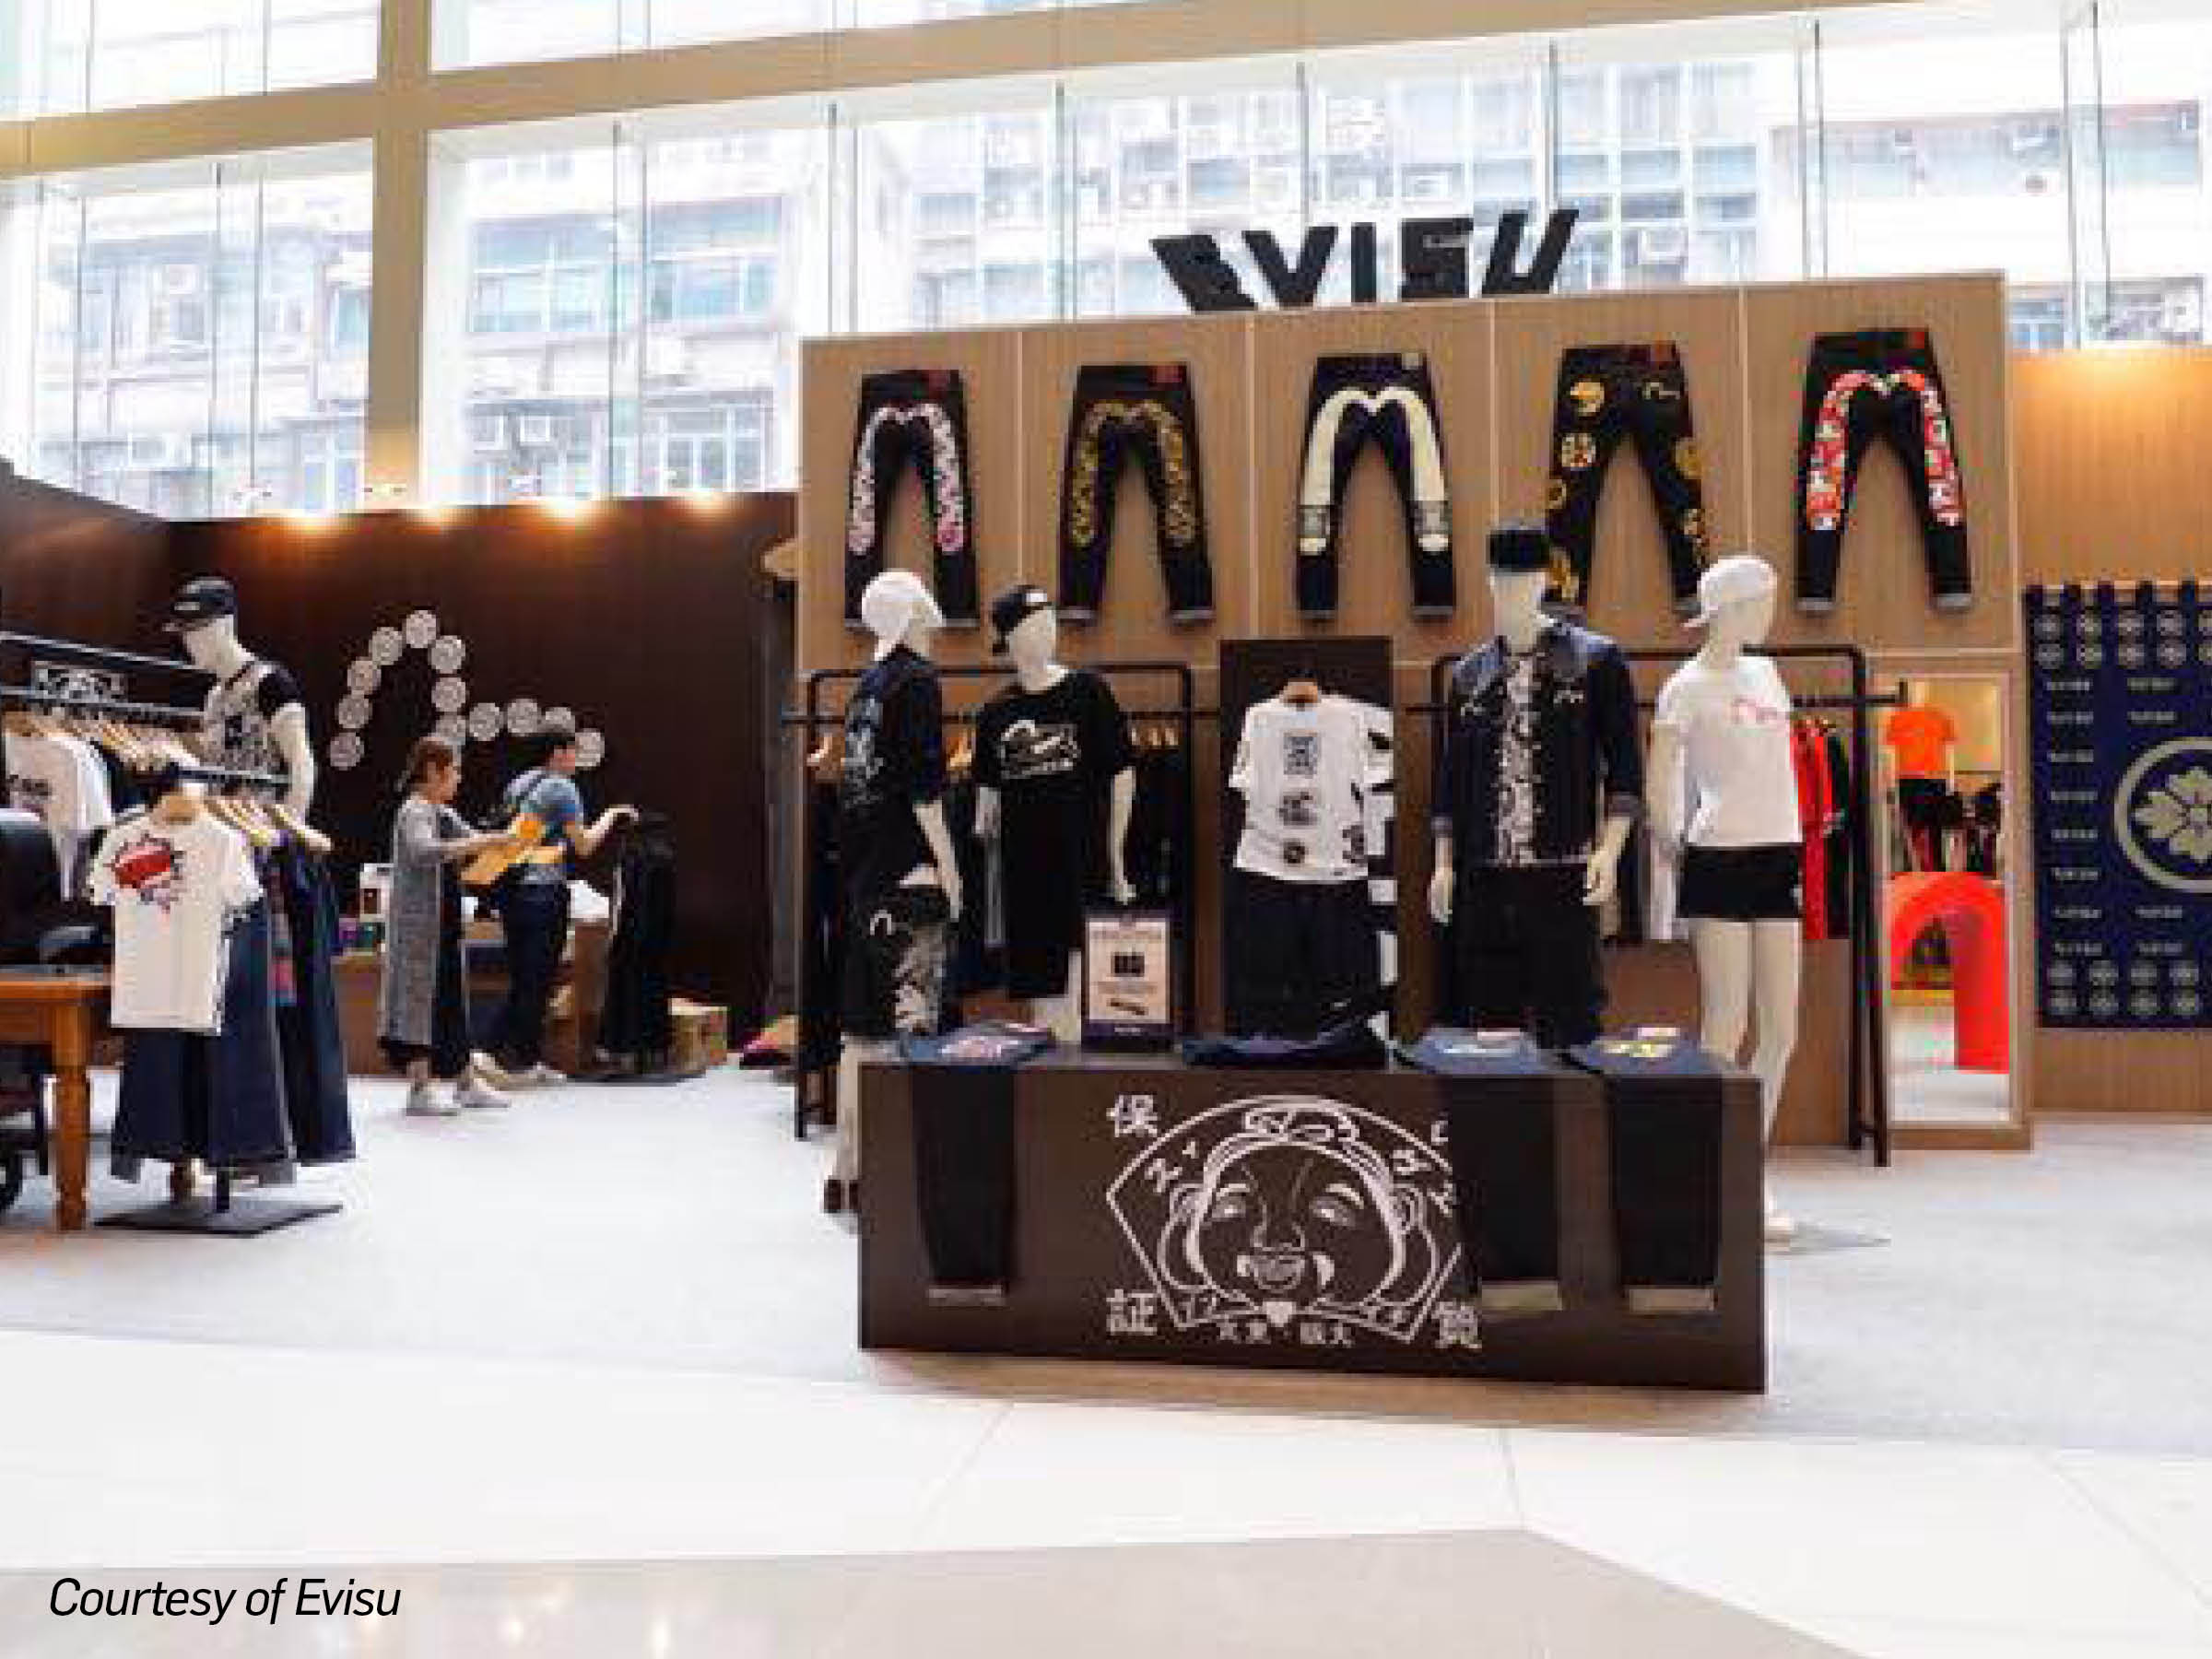 50 global retailers to enter India market